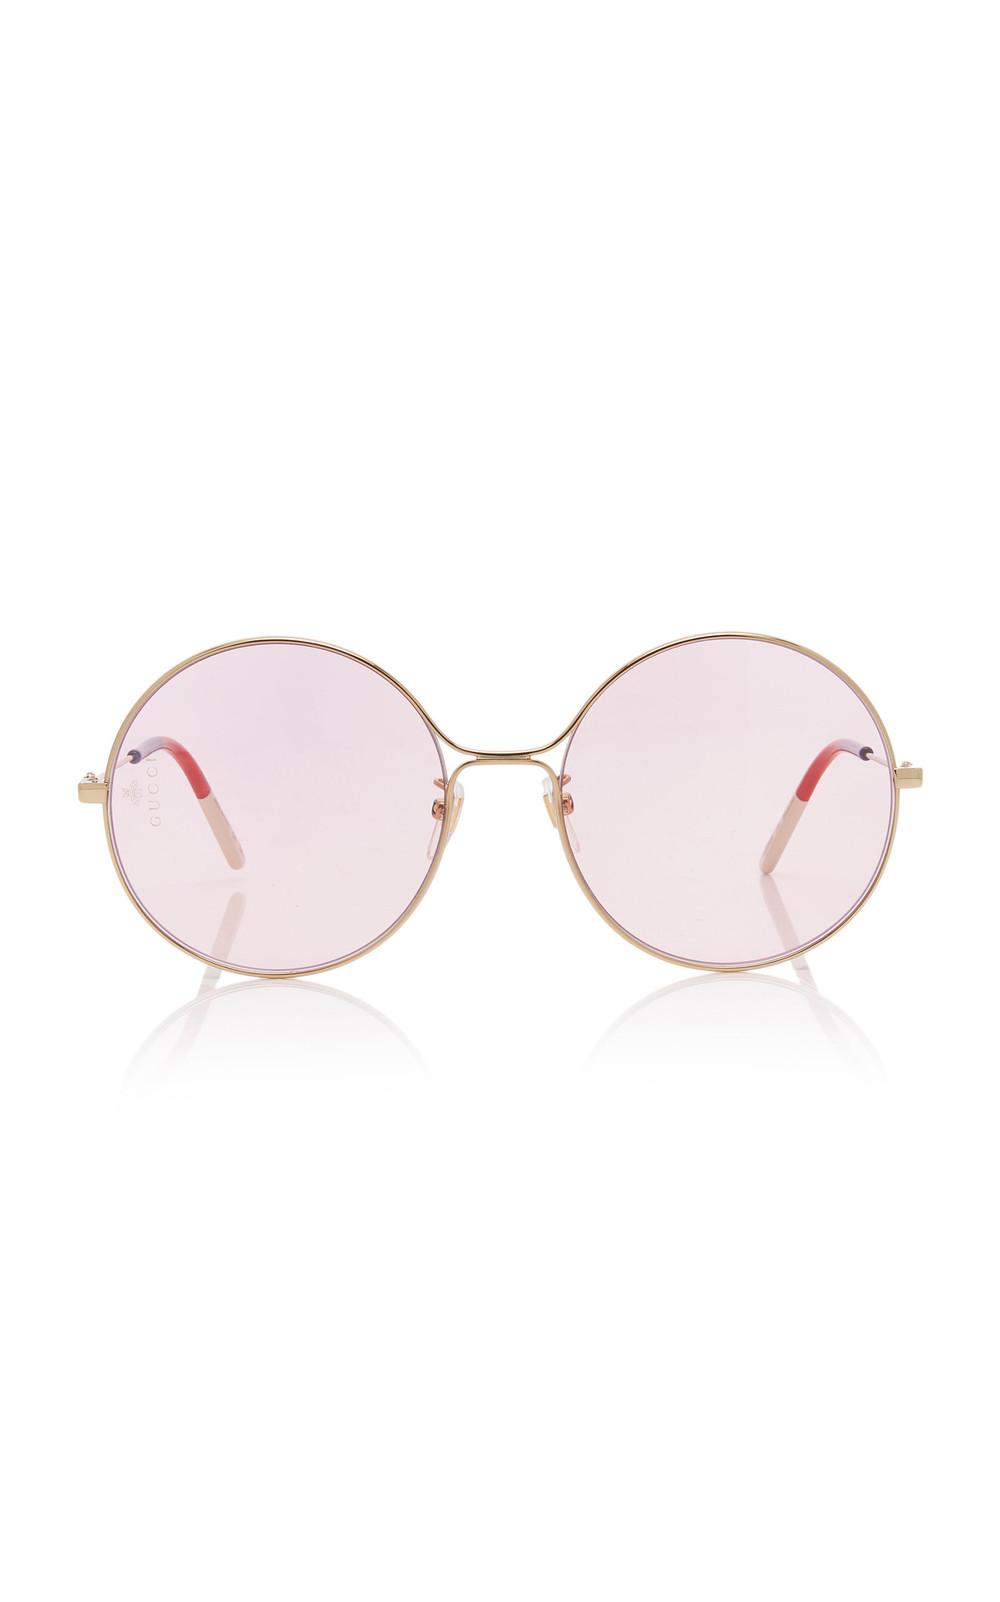 Gucci Sunglasses Glasant Oversized Metal Round Sunglasses in pink